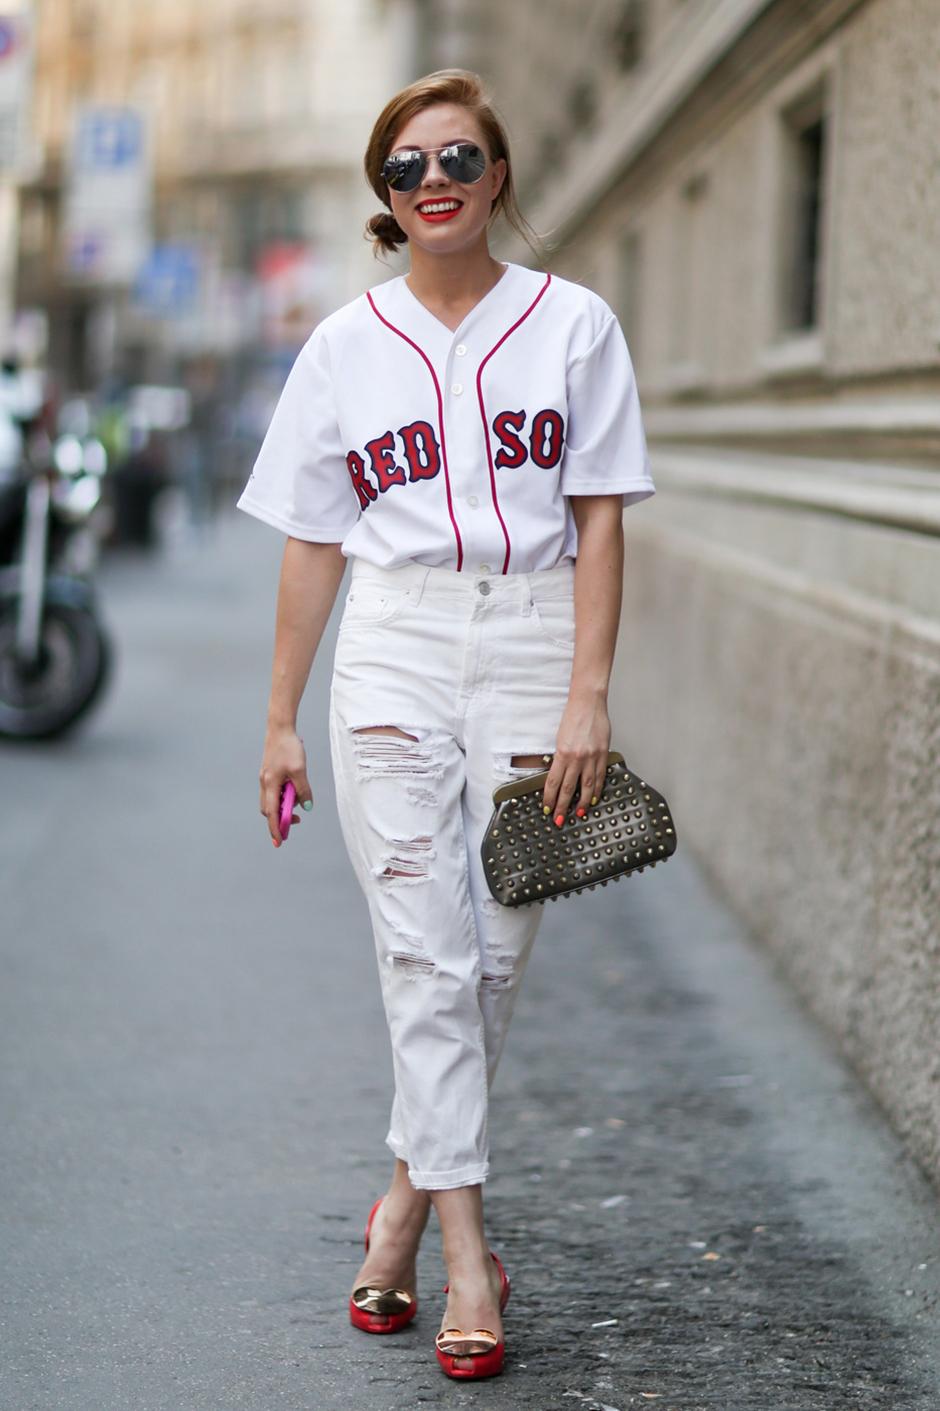 baseball_redsoxjersey_streetstyle.jpg